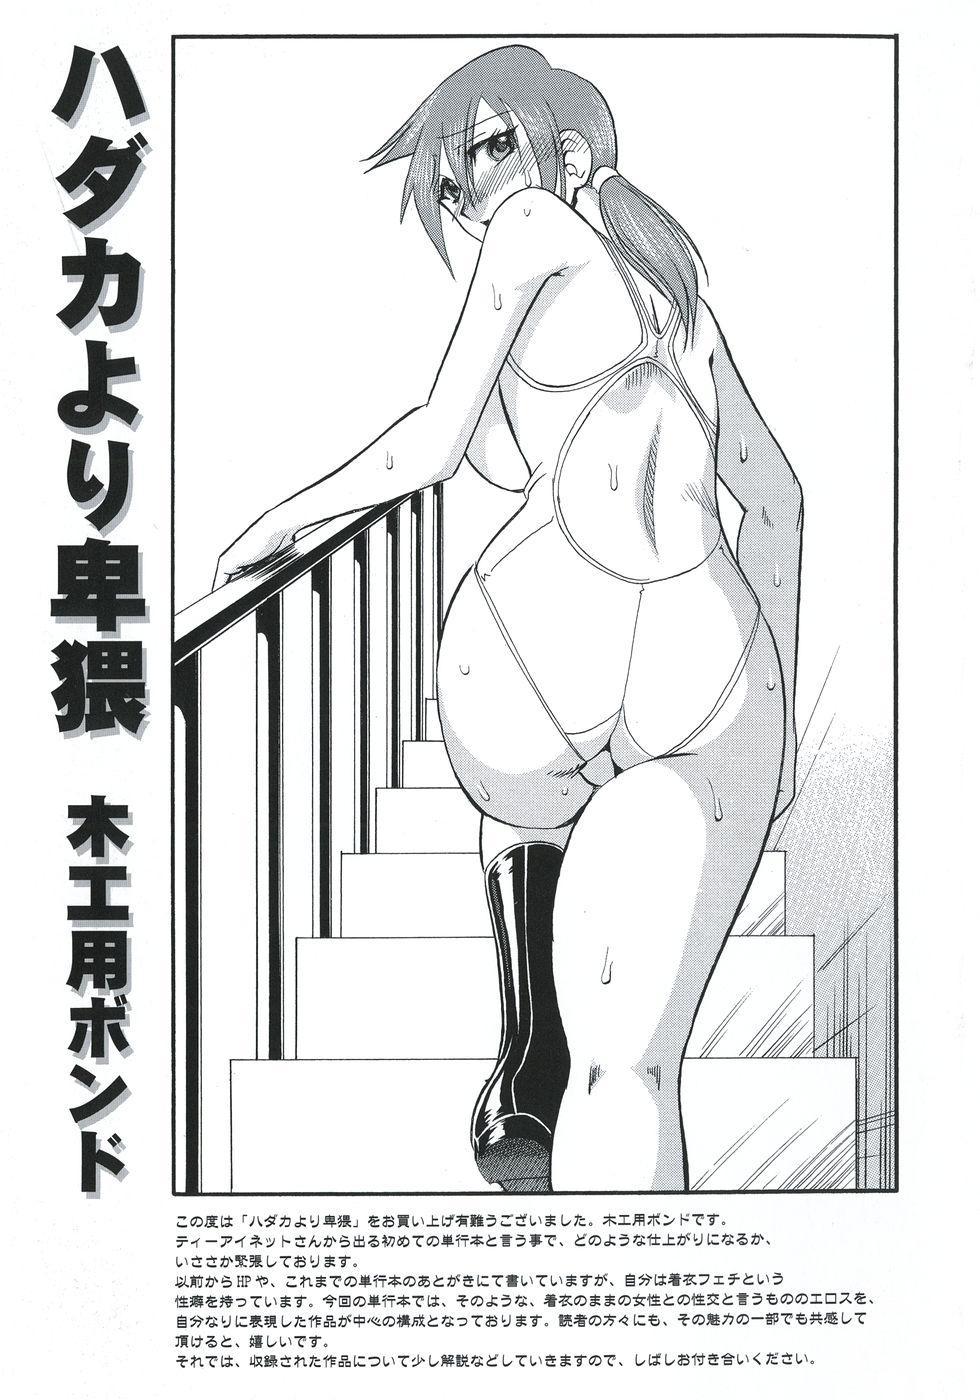 Hadaka Yori Hiwai - She is dirtier than nakedness 184